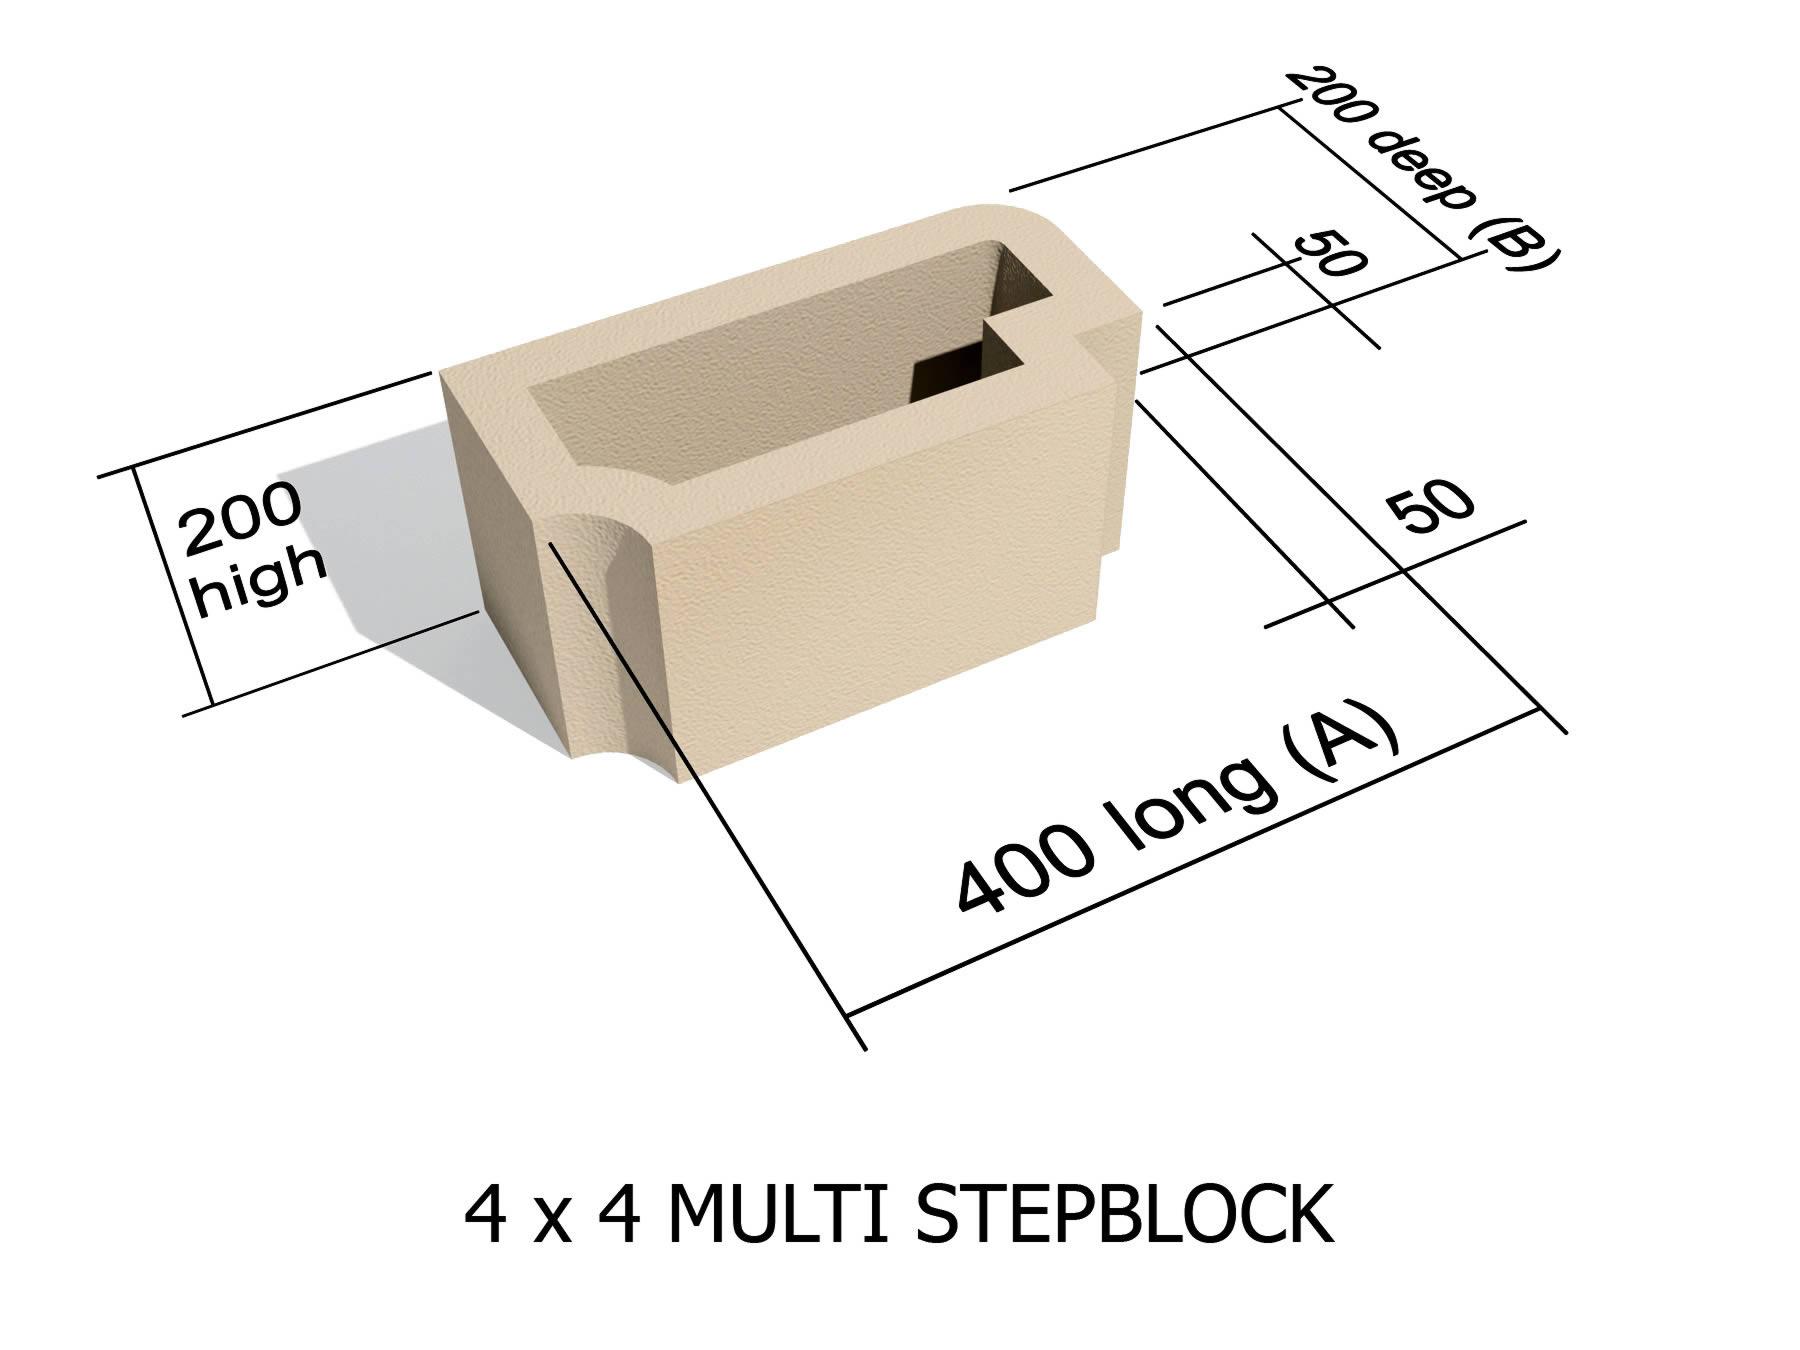 4 x 4 Multi Step block